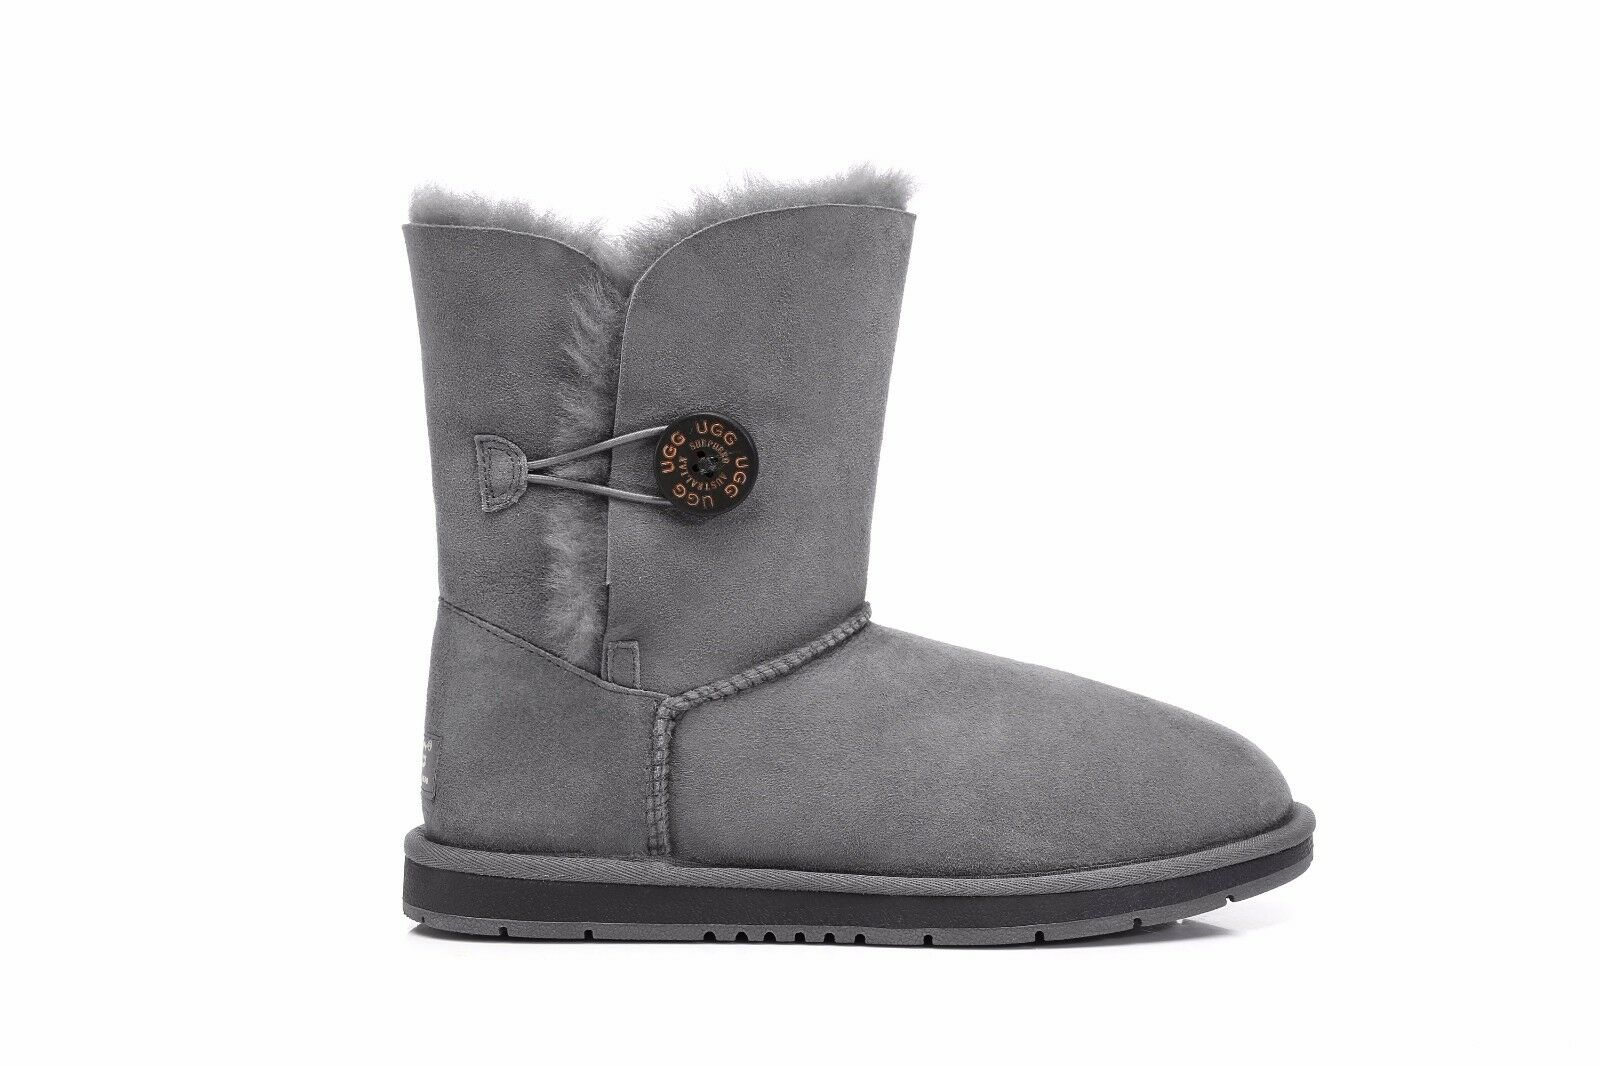 657ae9f4ed7 UGG BOOTS Short Classic With Crystal Button - Australian Sheepskin  Waterproof AU Ladies 9 / Men 7 / EU 40 Grey